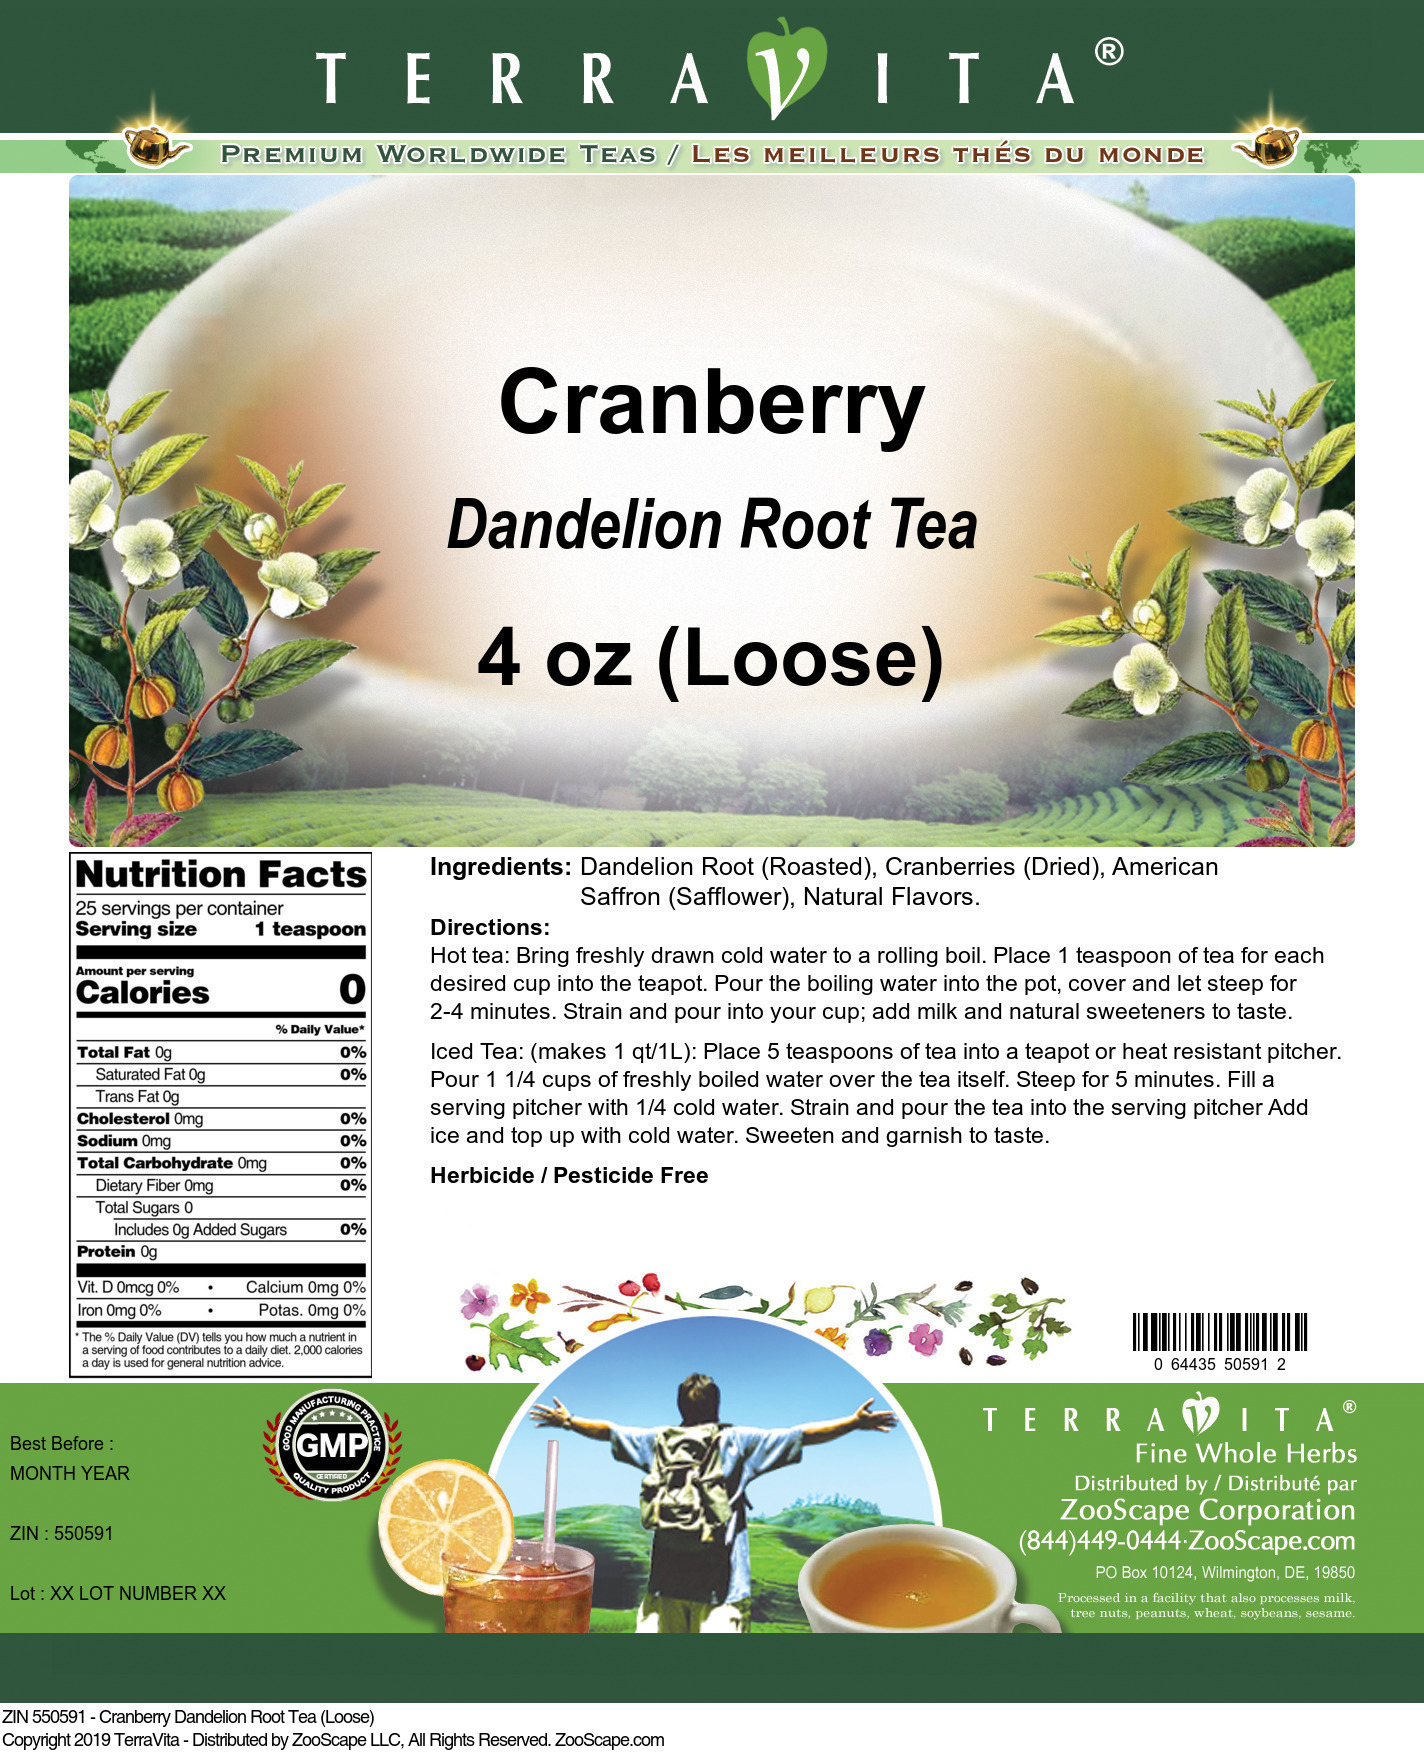 Cranberry Dandelion Root Tea (Loose)